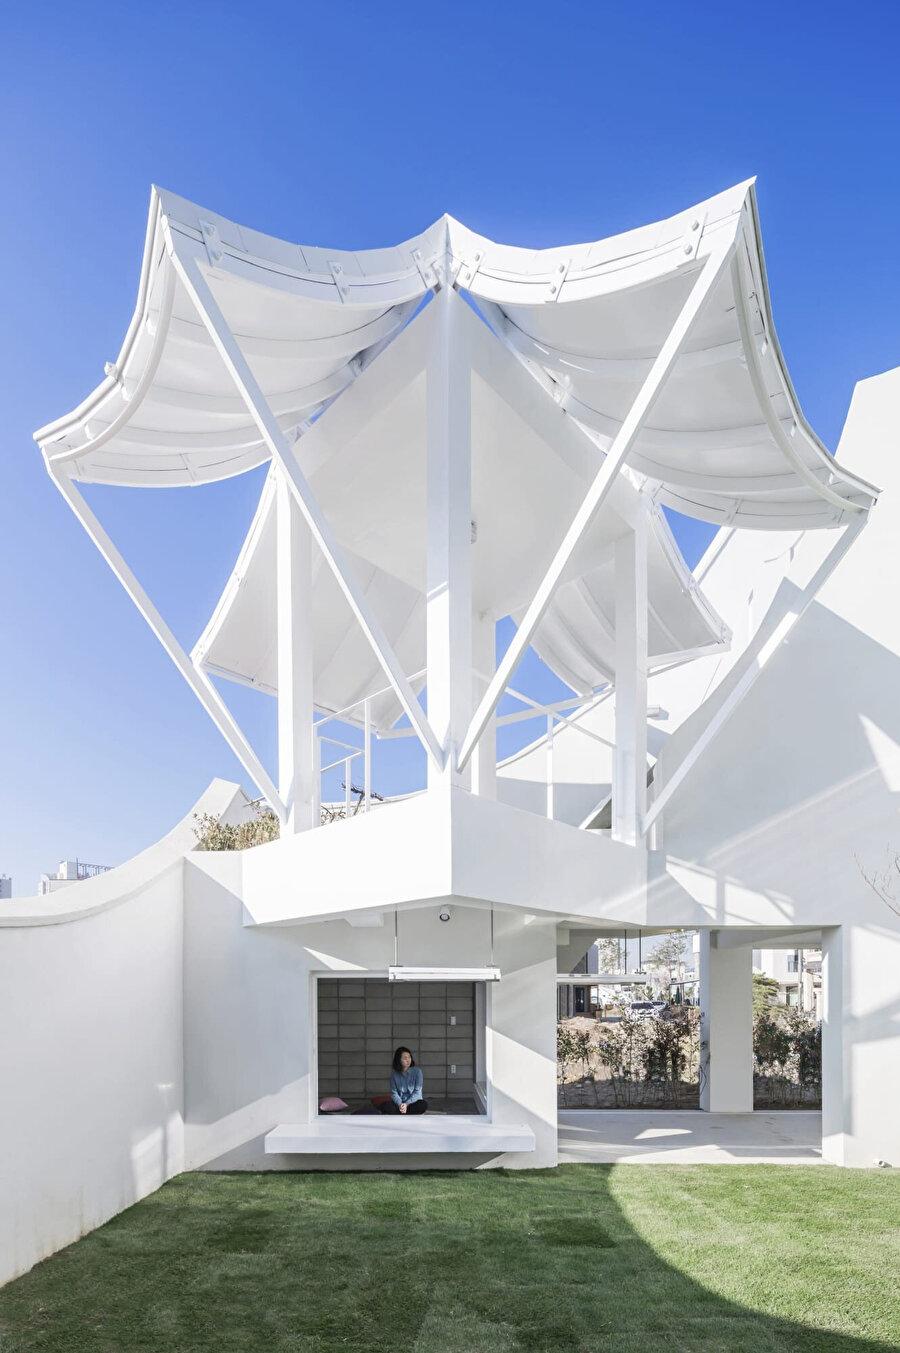 Rumaru pavyonunun çatı kotundan görünümü.